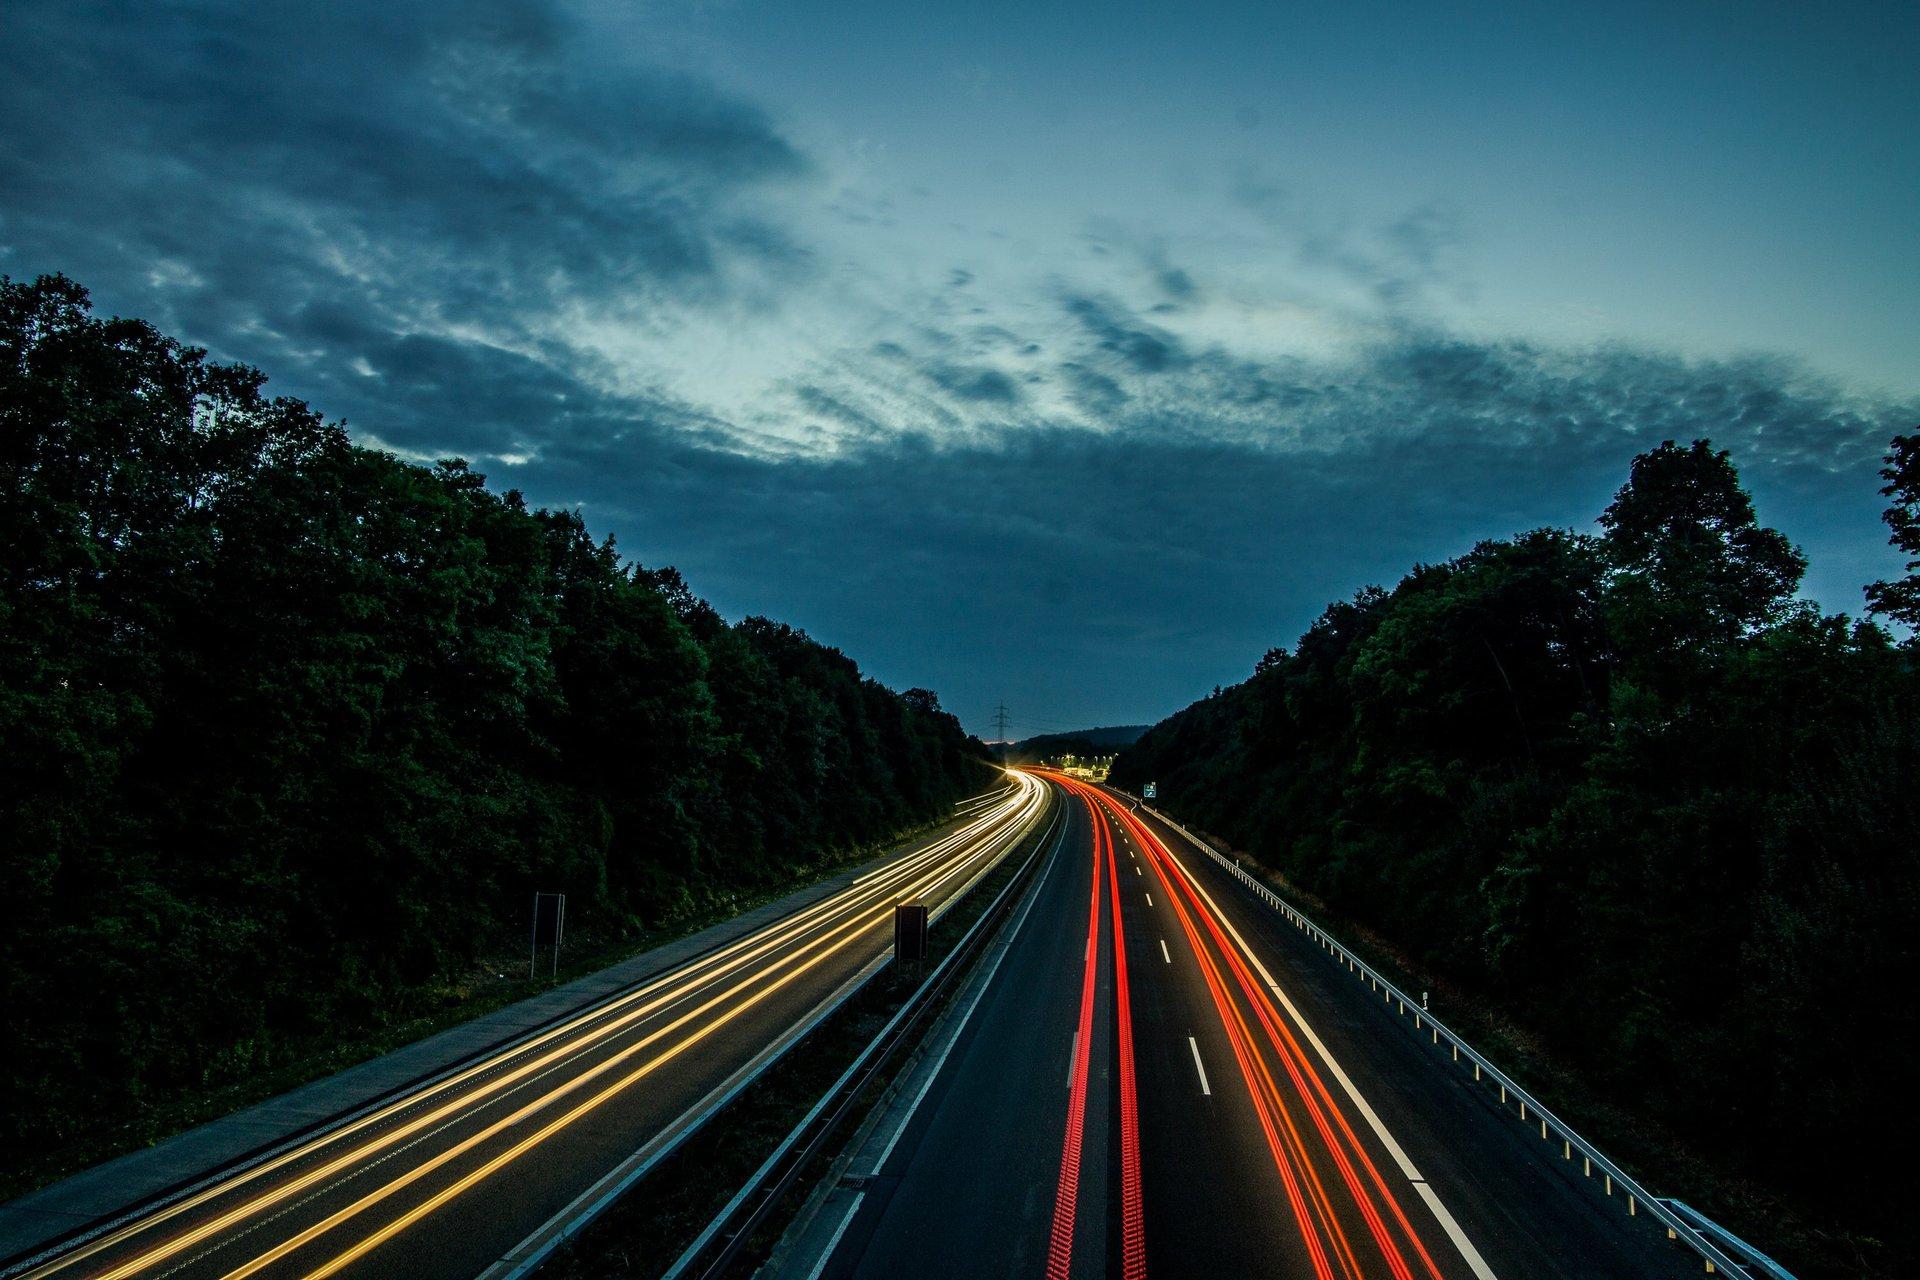 sky night cars fast